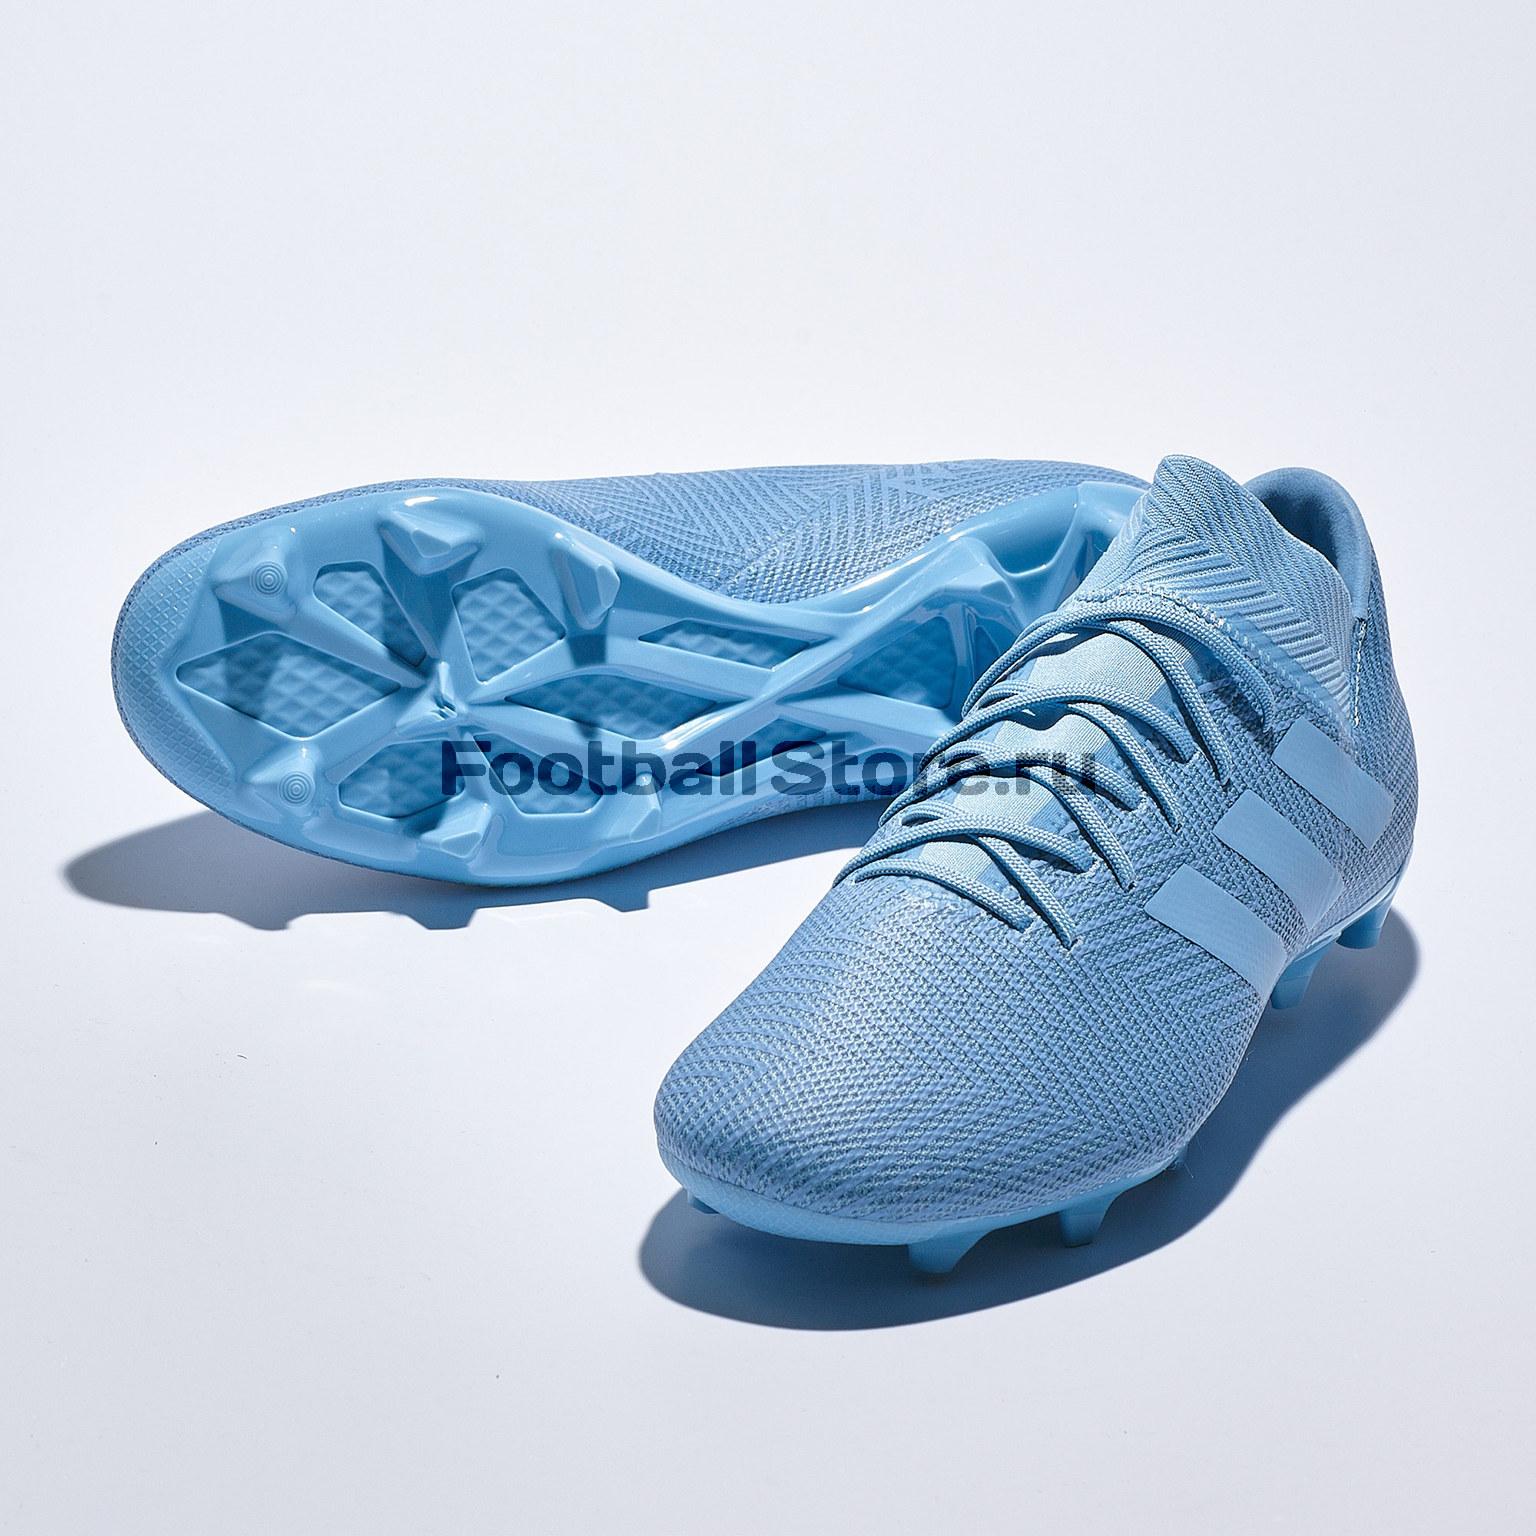 Бутсы Adidas Nemeziz Messi 18.3 FG DB2112 бутсы adidas messi 16 1 fg jr bb3852